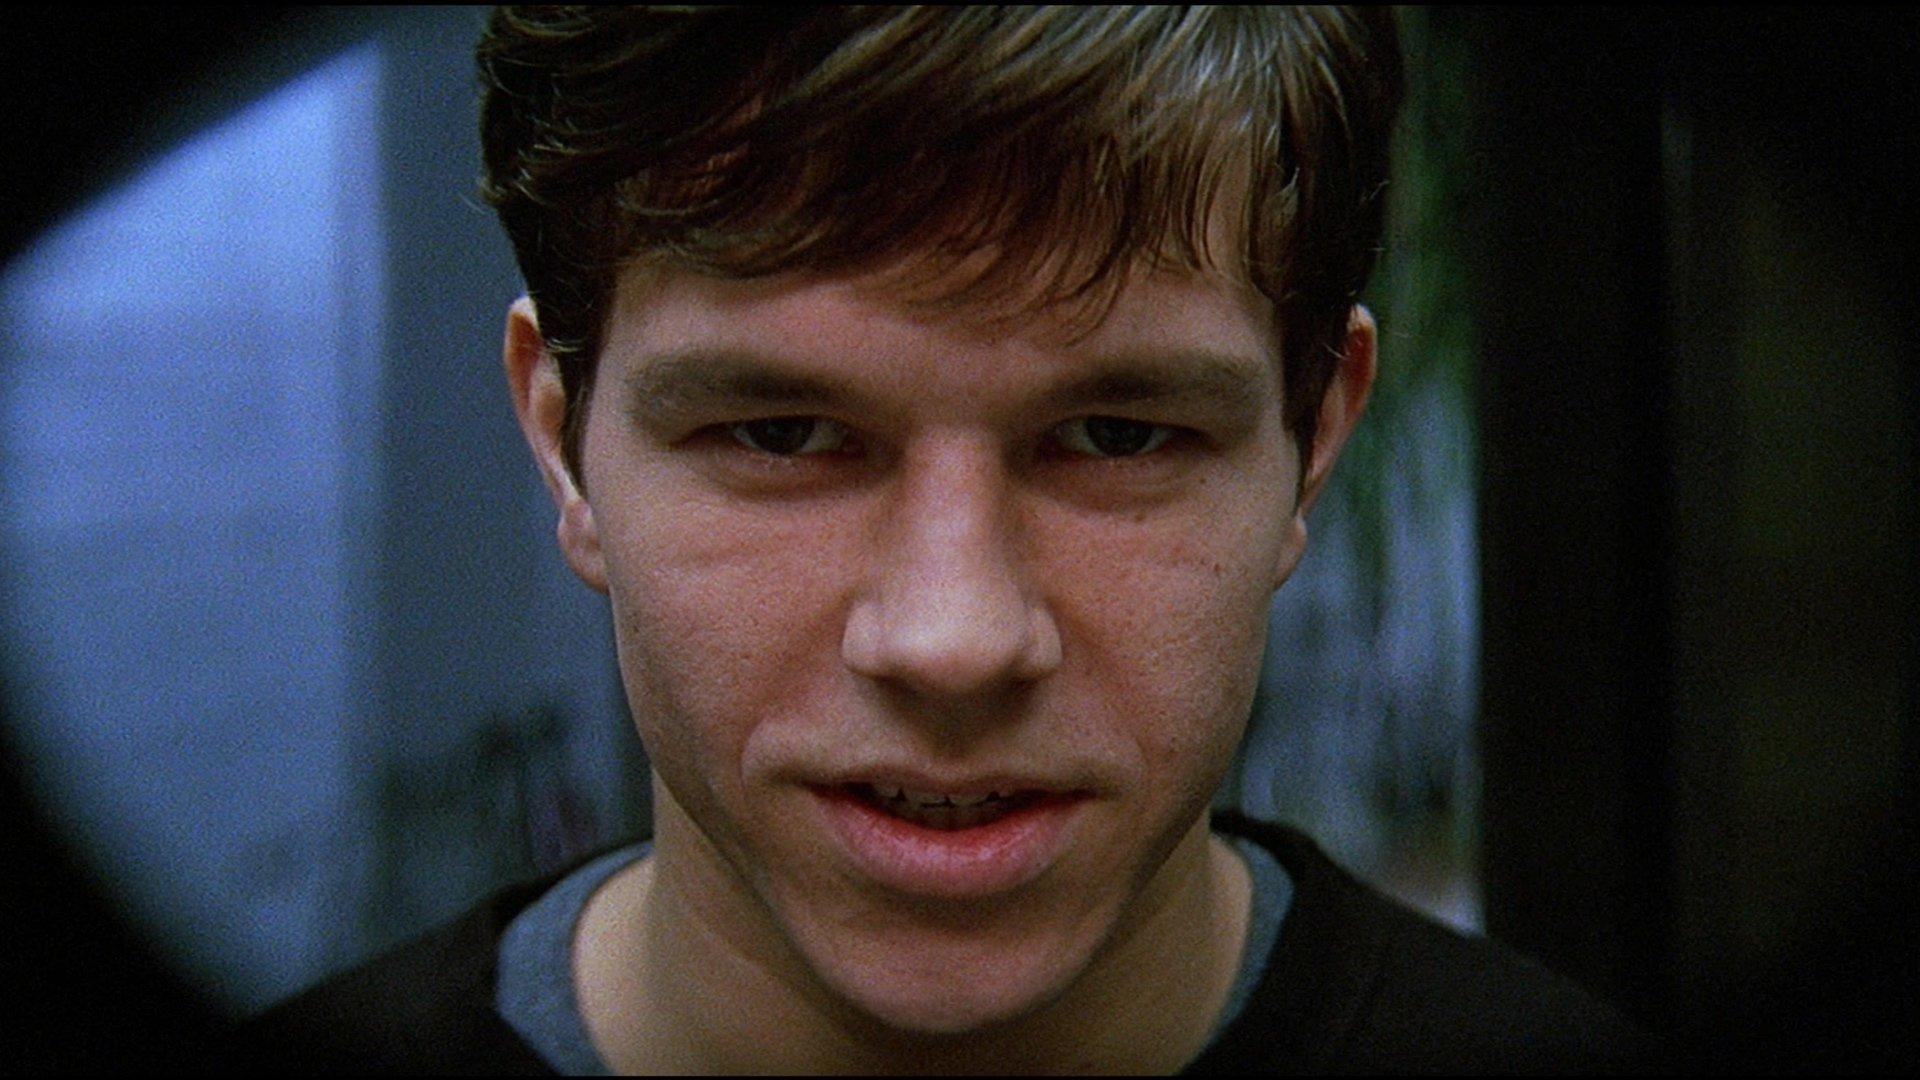 Alyssa Milano Movie Clips we love '90s horror] embracing the trashy pleasures of 'fear